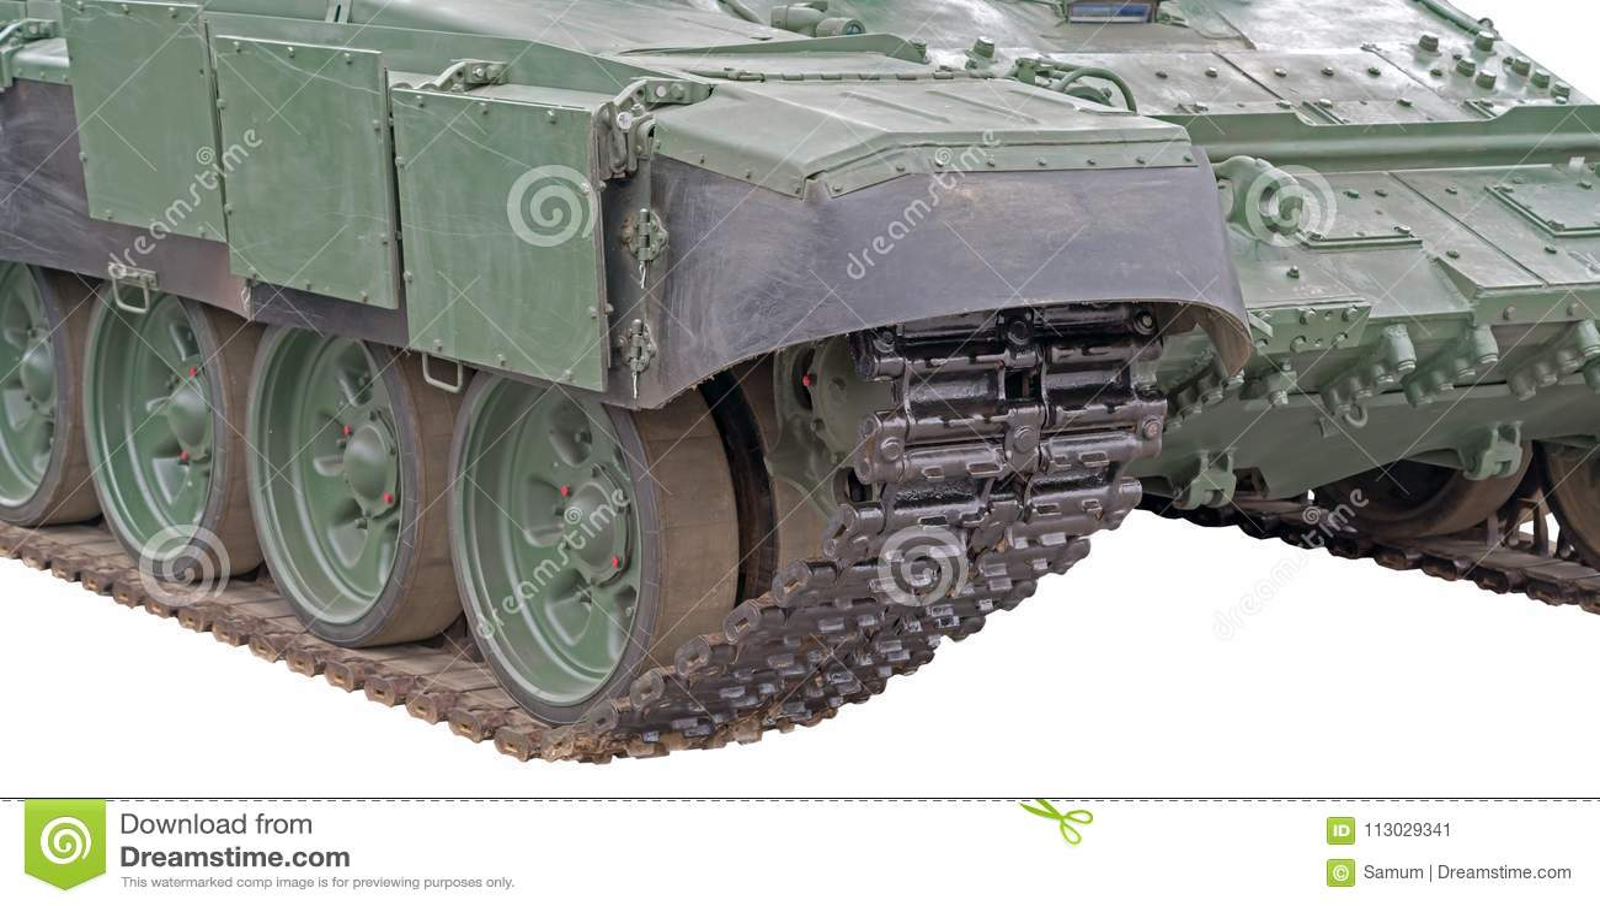 Pista de Caterpillar de un tanque militar en blanco